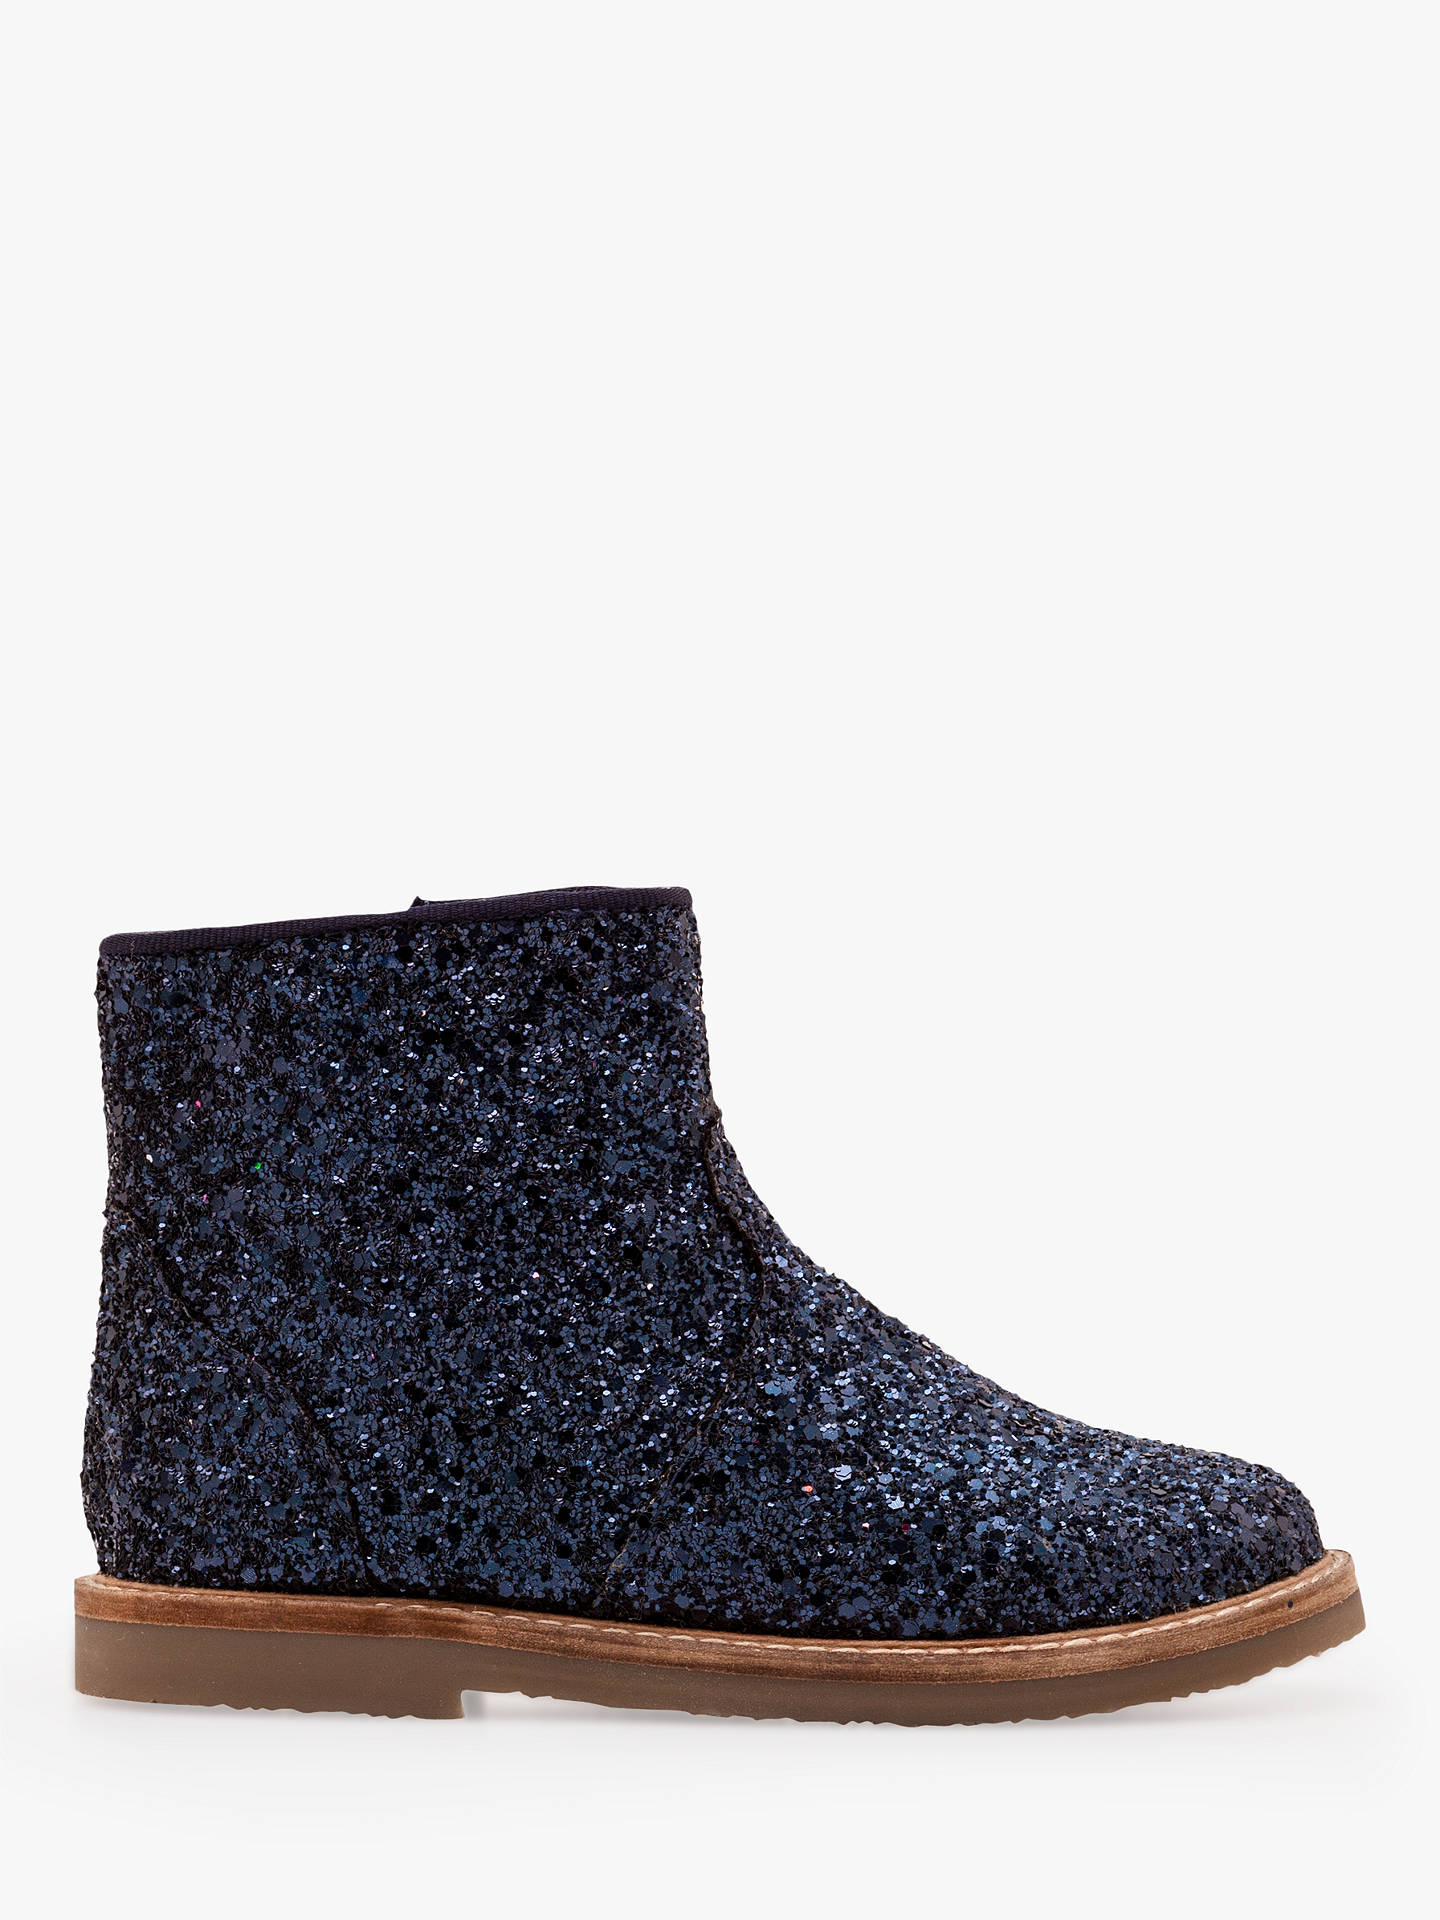 Mini Boden Children S Glitter Boots At John Lewis Amp Partners